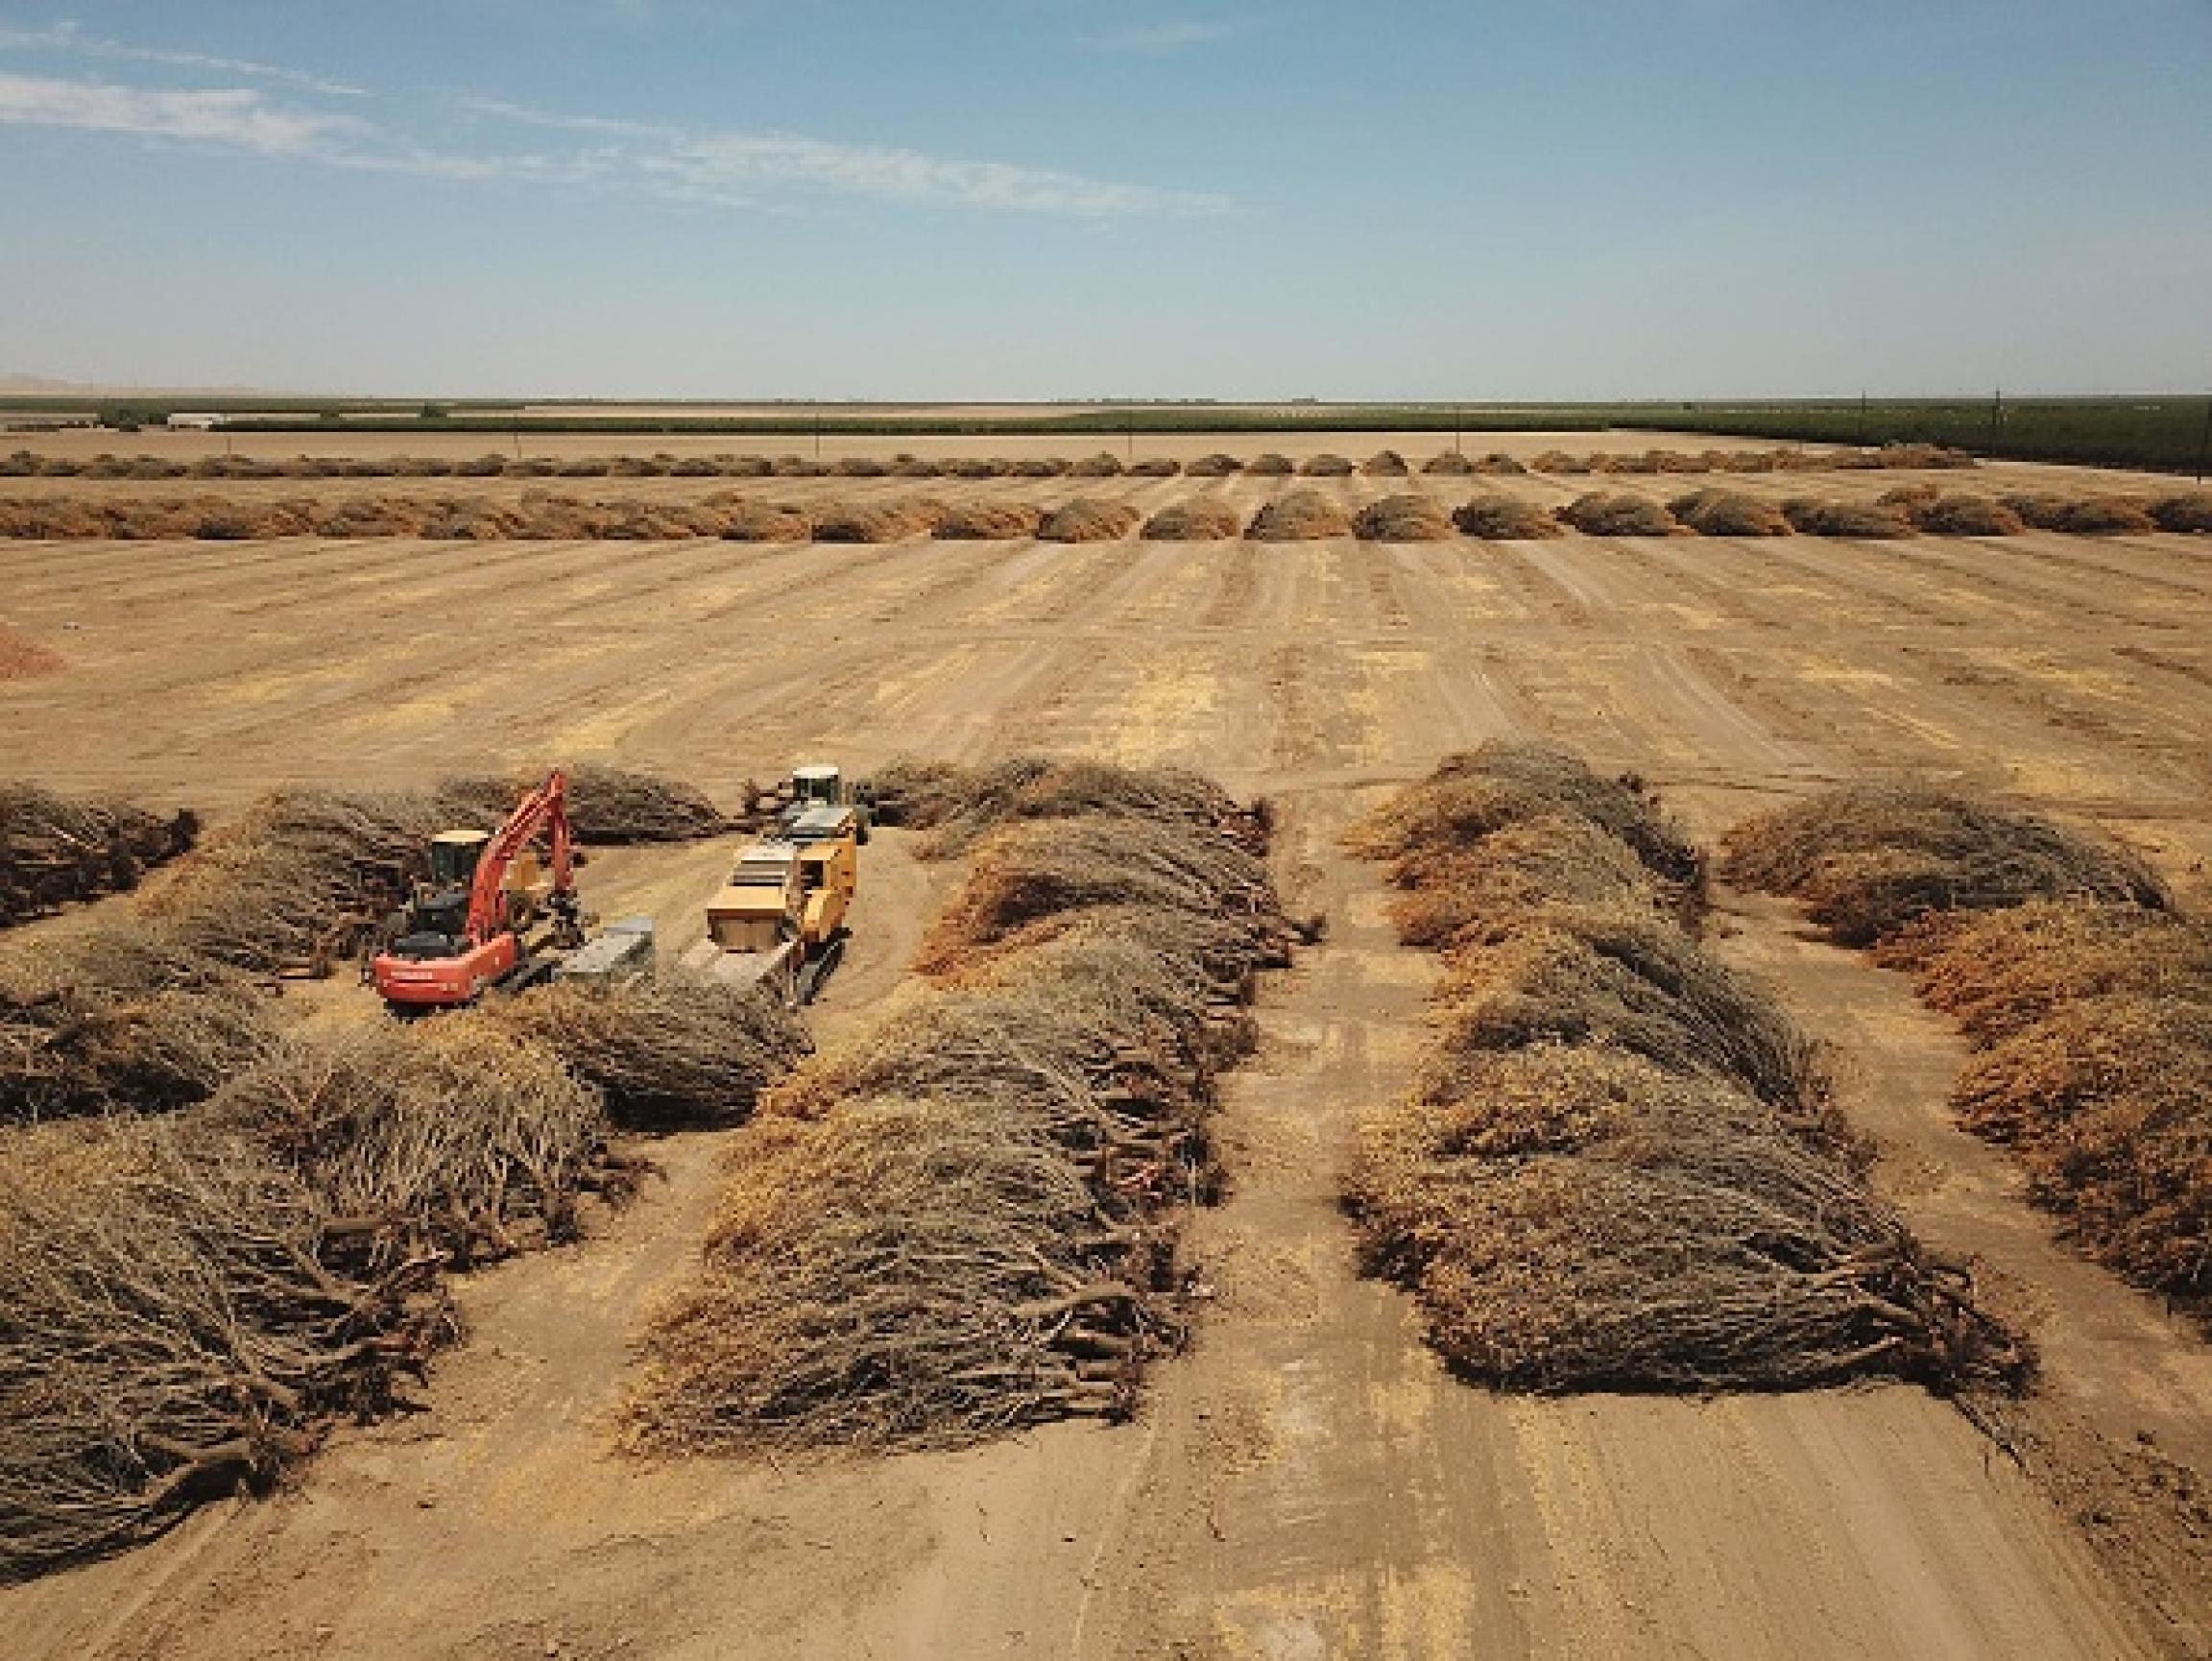 Farmer ripping almond trees